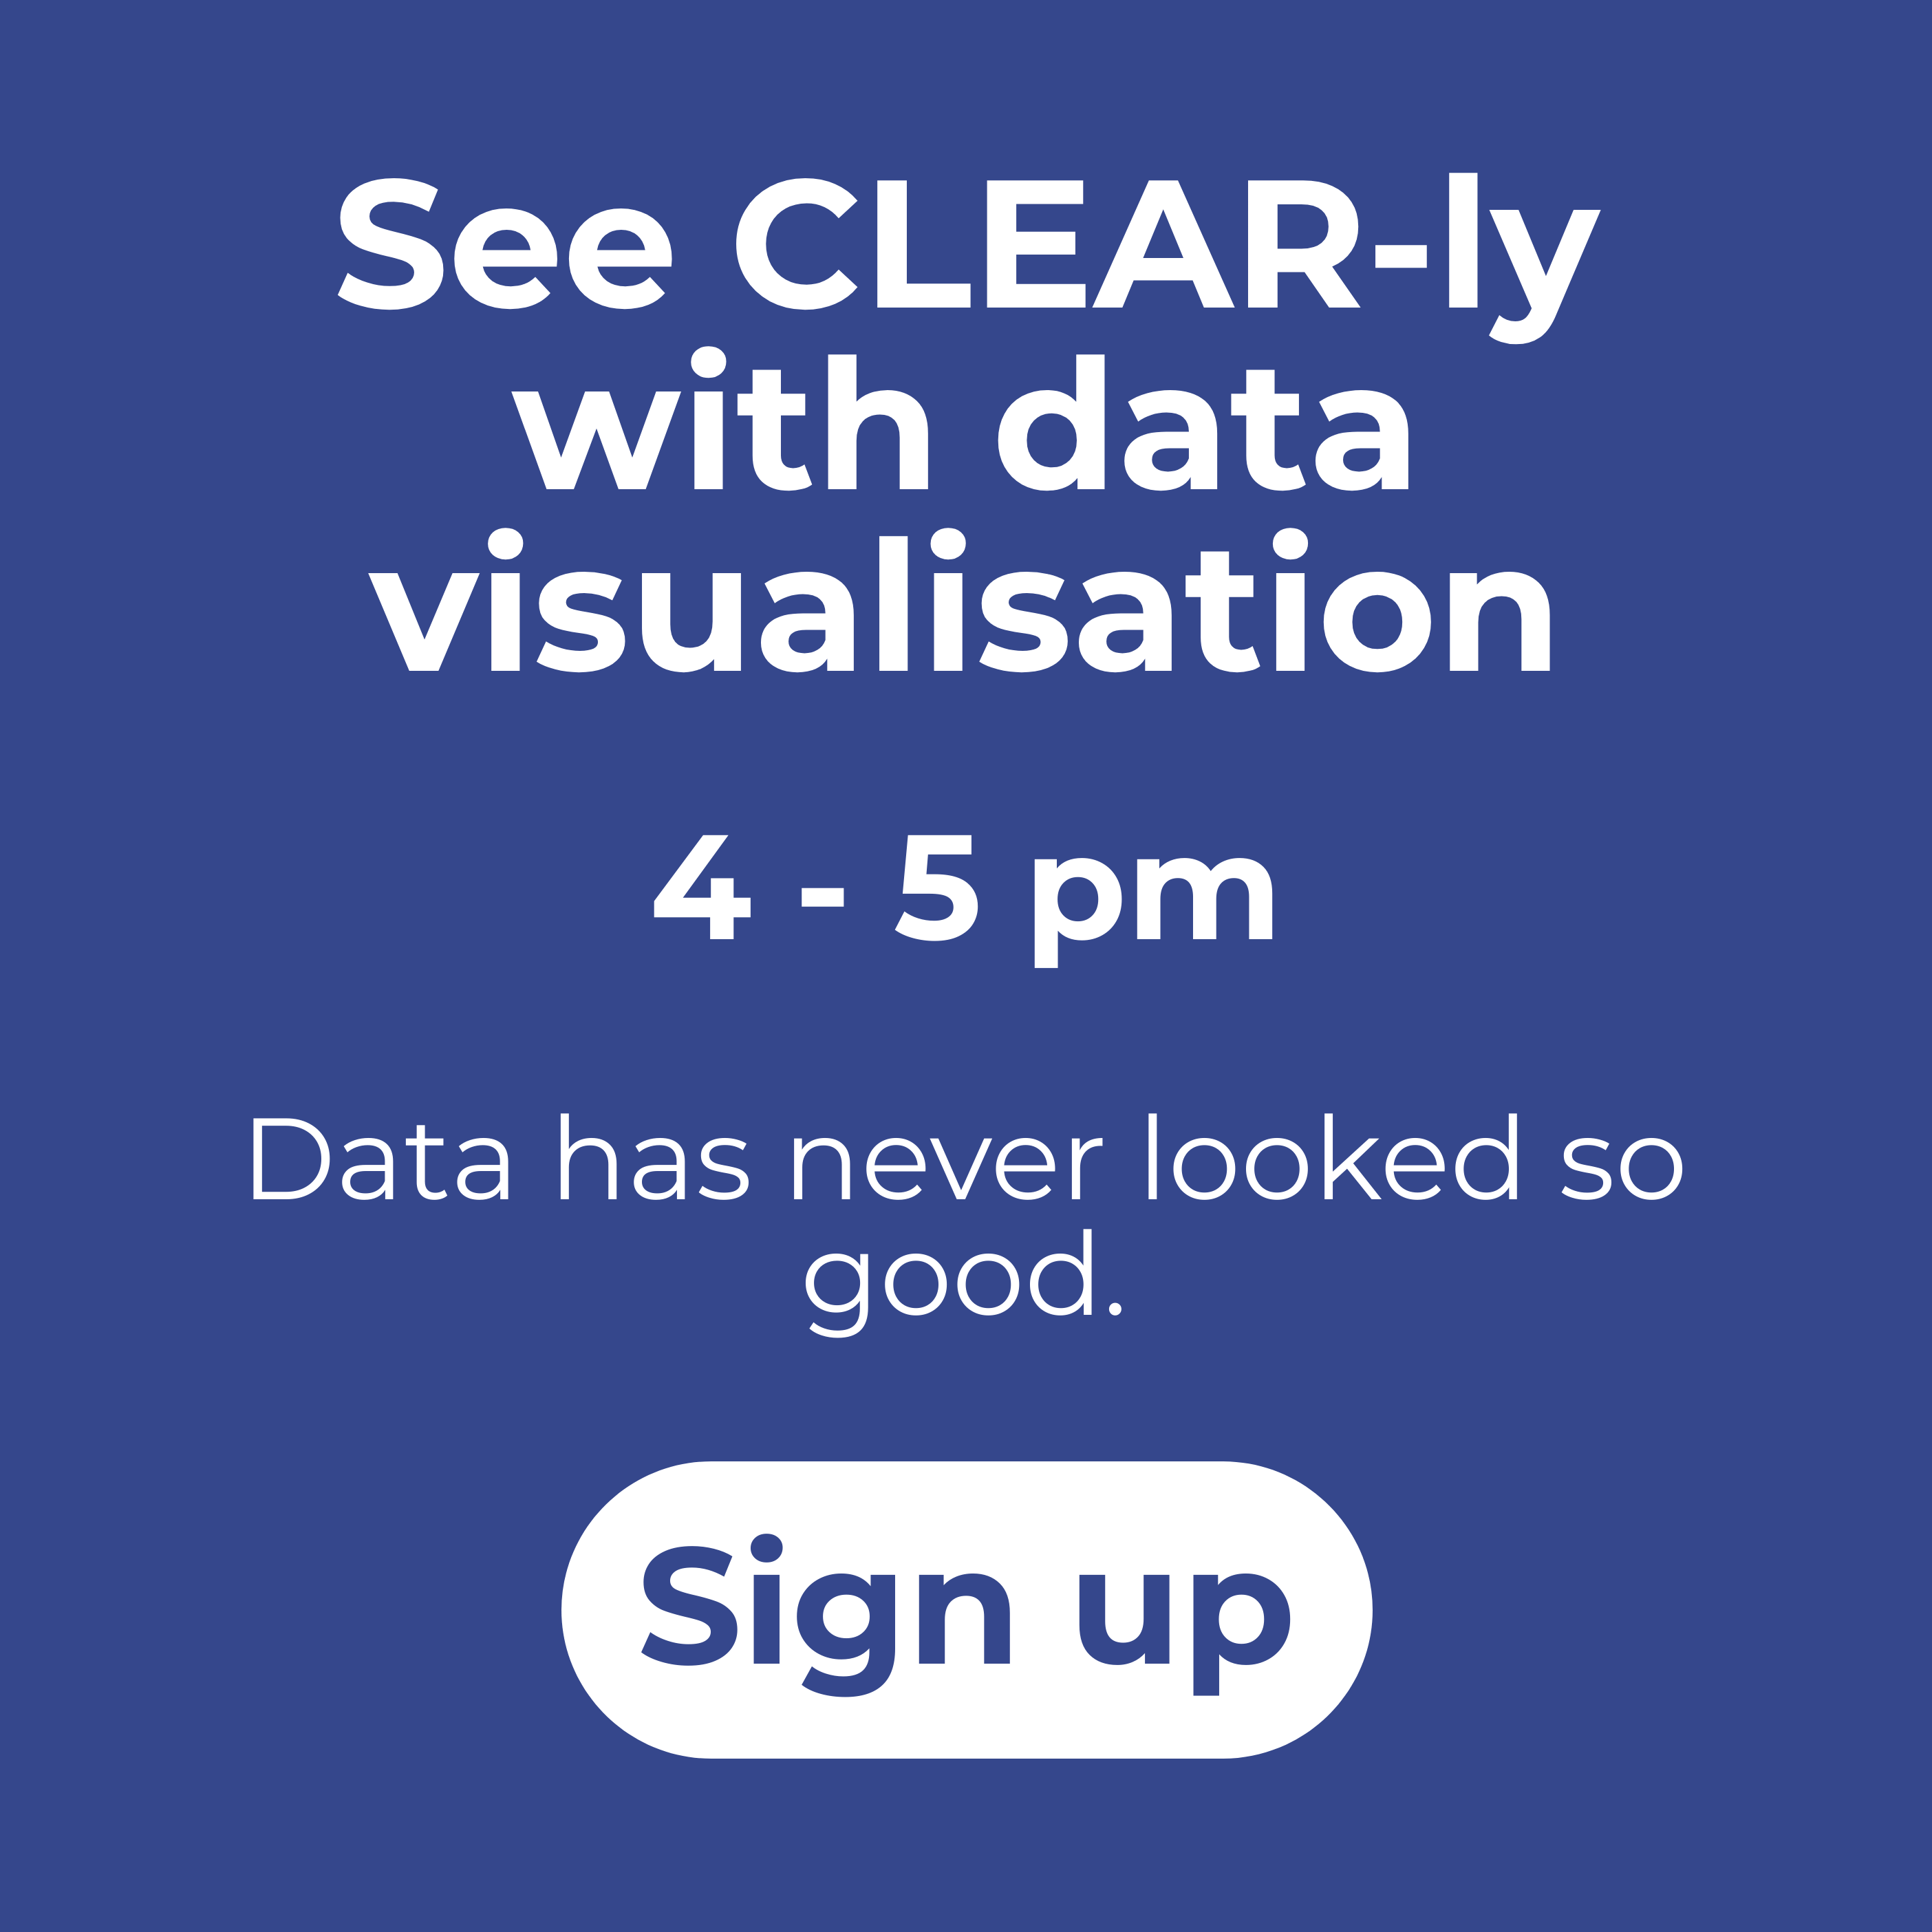 Data visualisation session